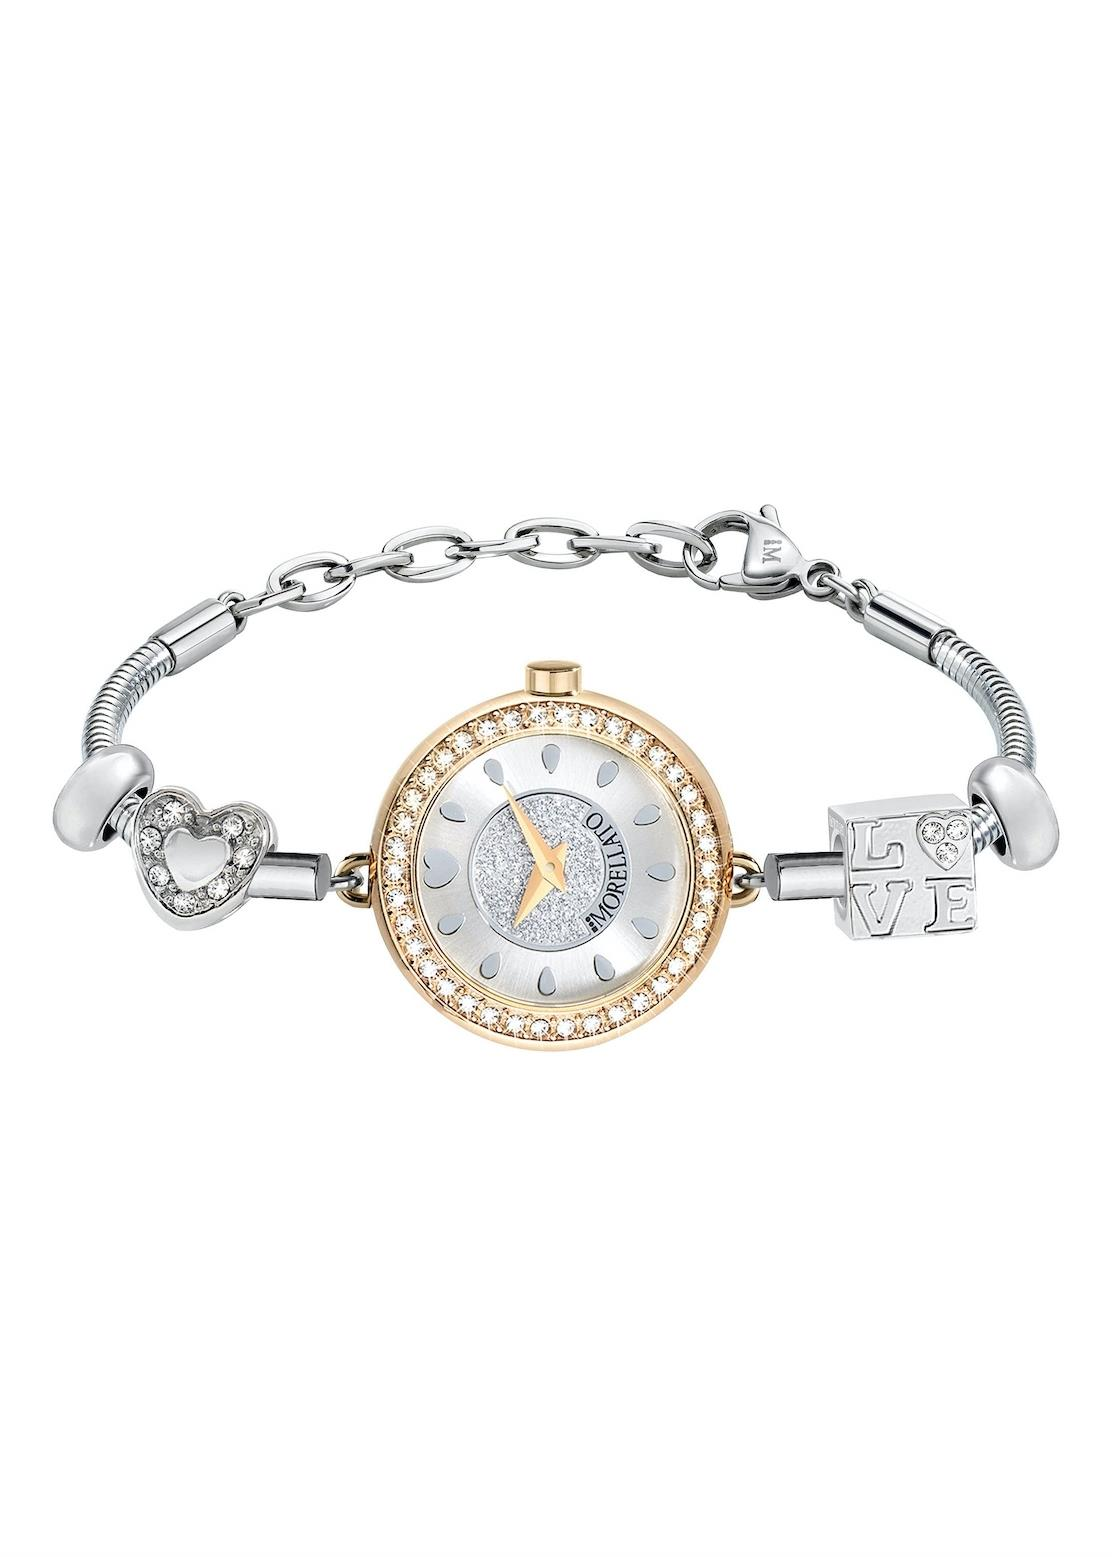 MORELLATO TIME Ladies Wrist Watch Model DROPS MPN R0153122593